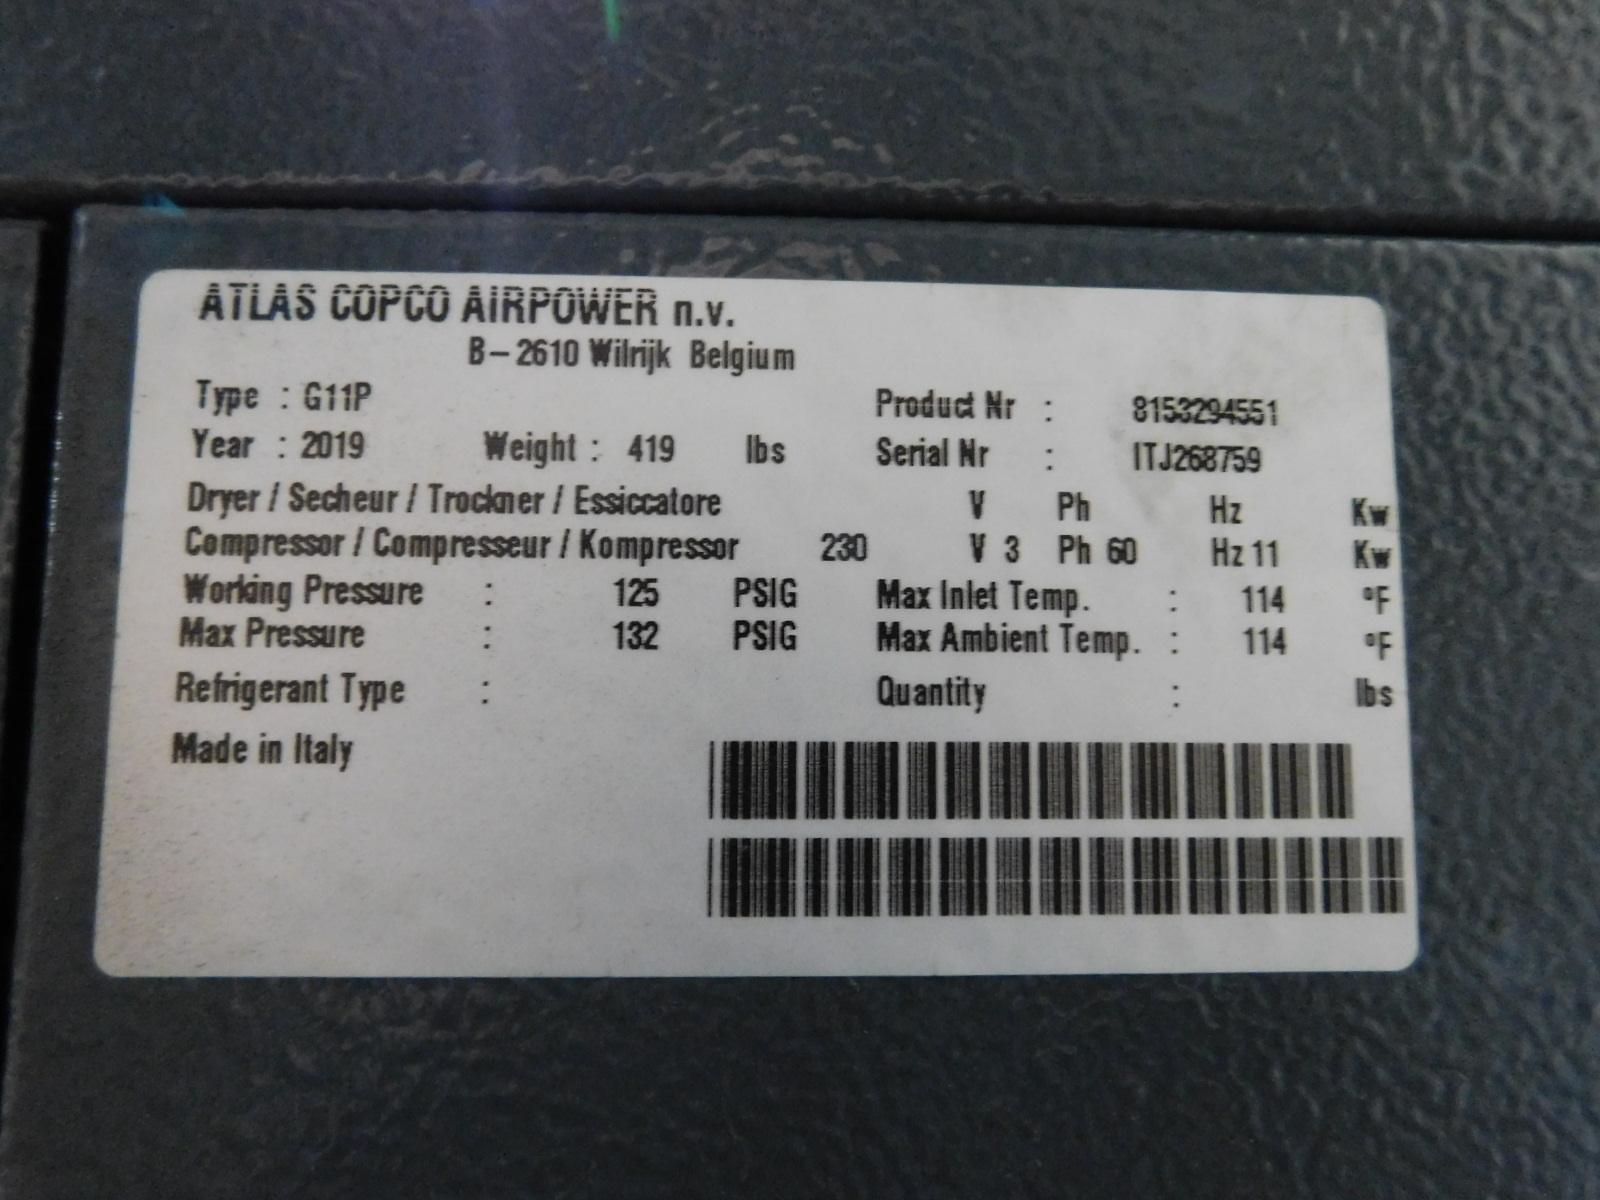 2019 ATLAS COPCO G11 15 HP ROTARY SCREW AIR COMPRESSOR, 125 PSI, S/N ITJ268759 - Image 2 of 2